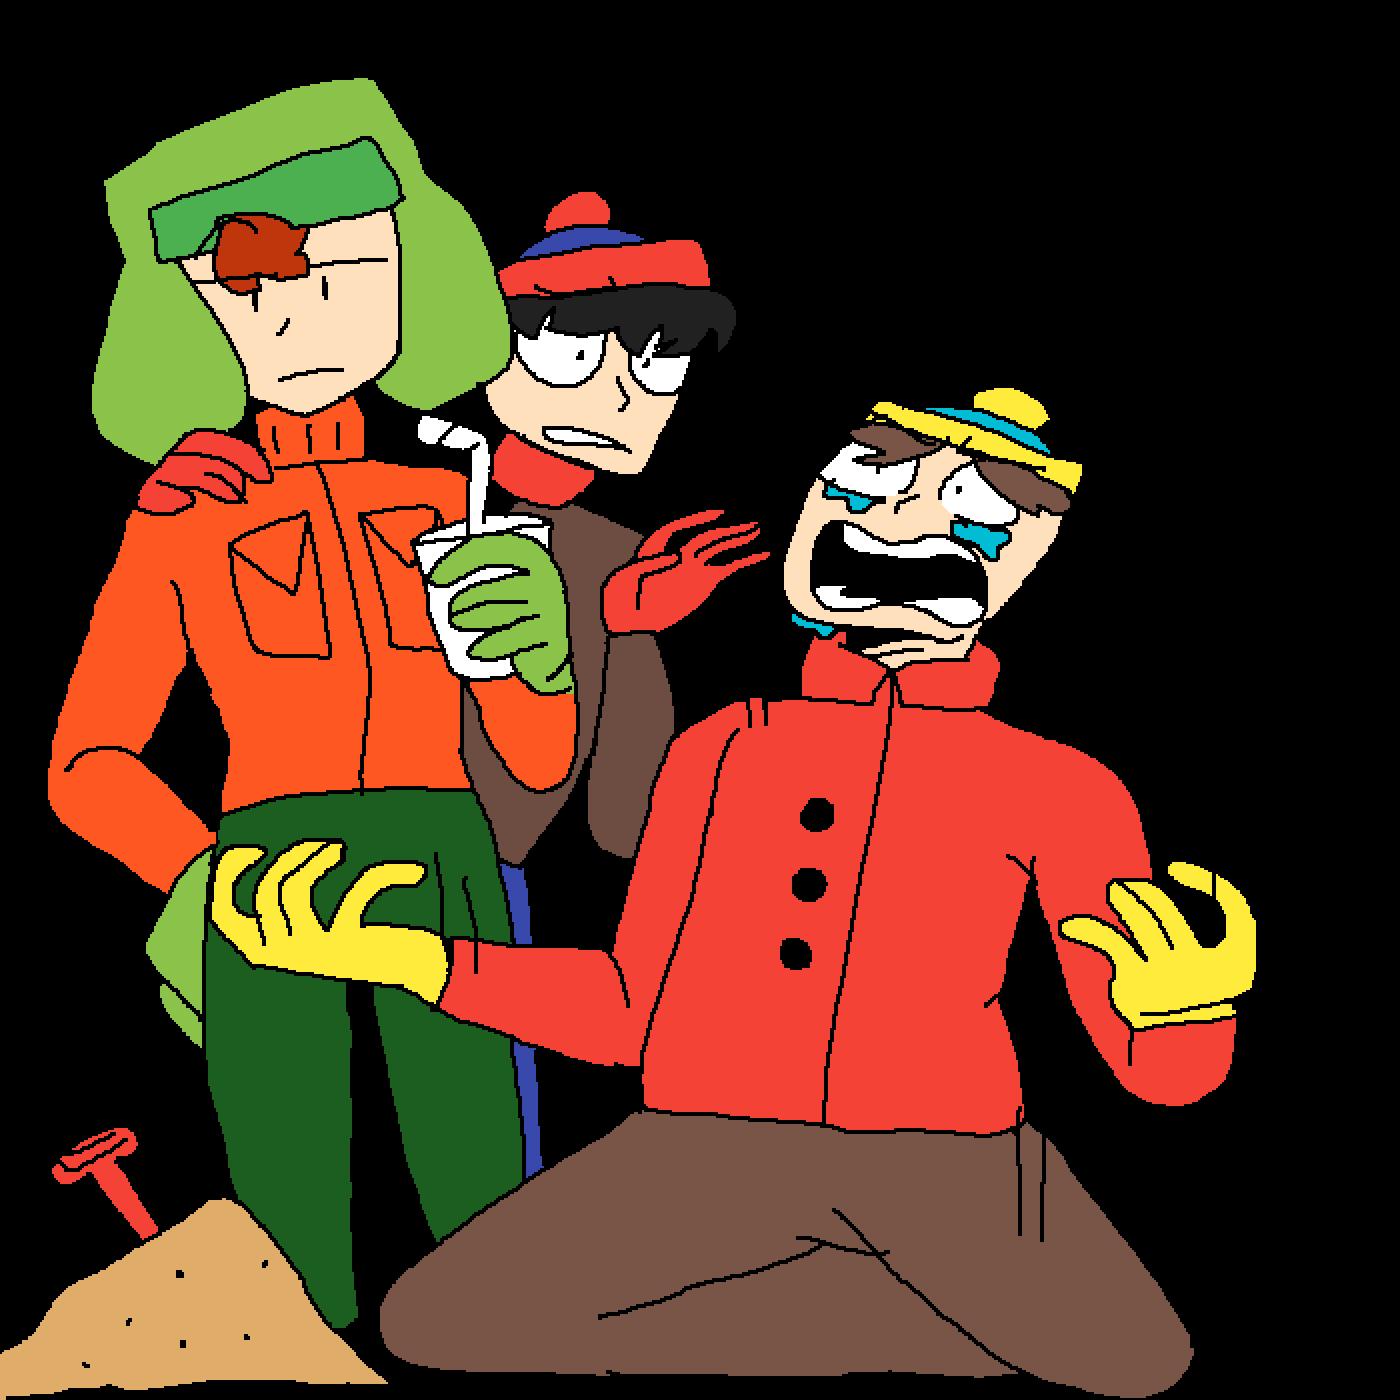 Trashy South Park Base by kiwianimations